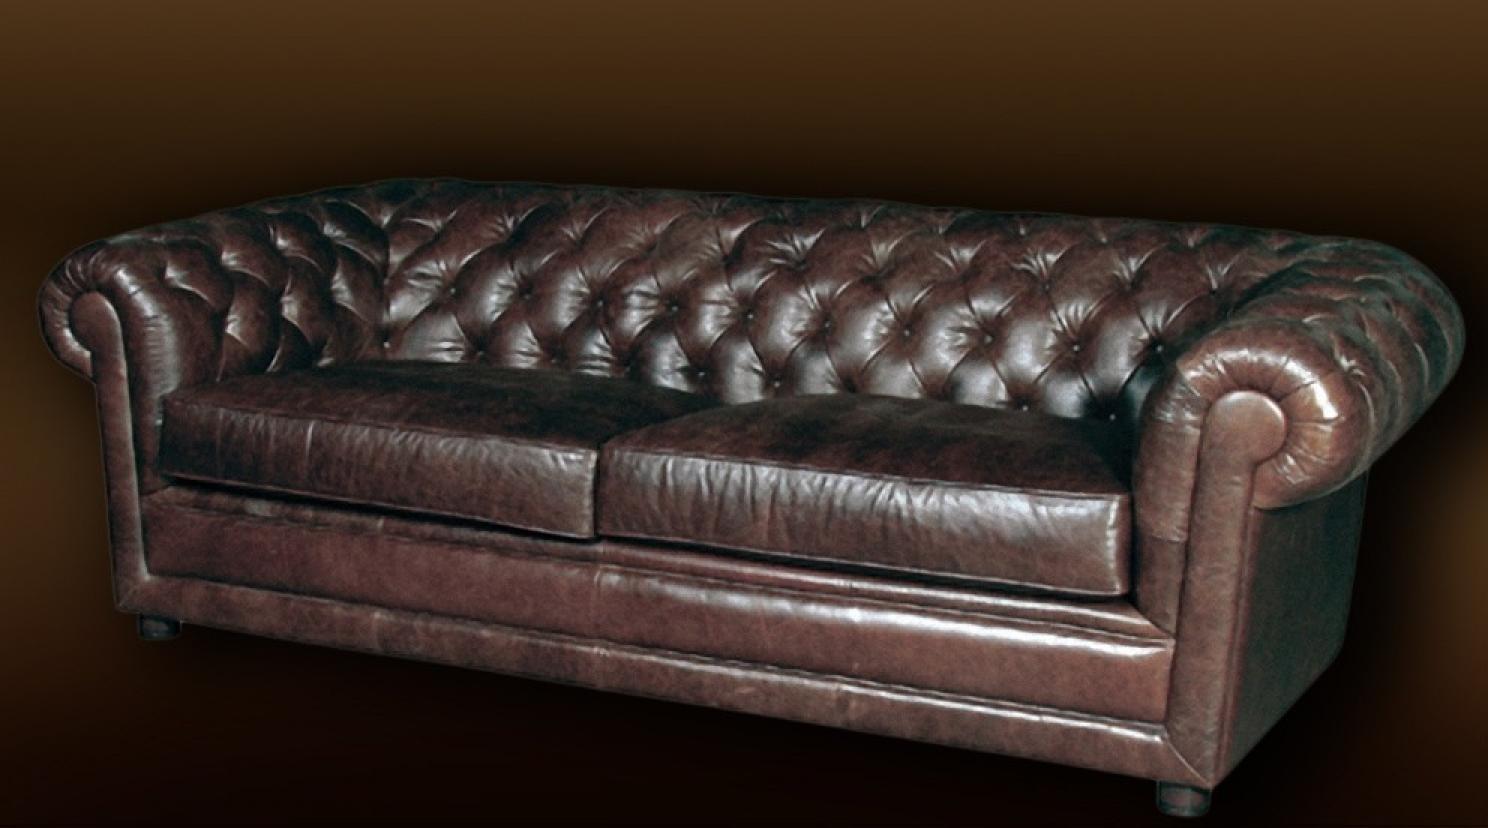 D co fauteuil chesterfield cuir 21 fauteuil ikea bureau fauteuil de jar - Fauteuil chesterfield cuir pas cher ...